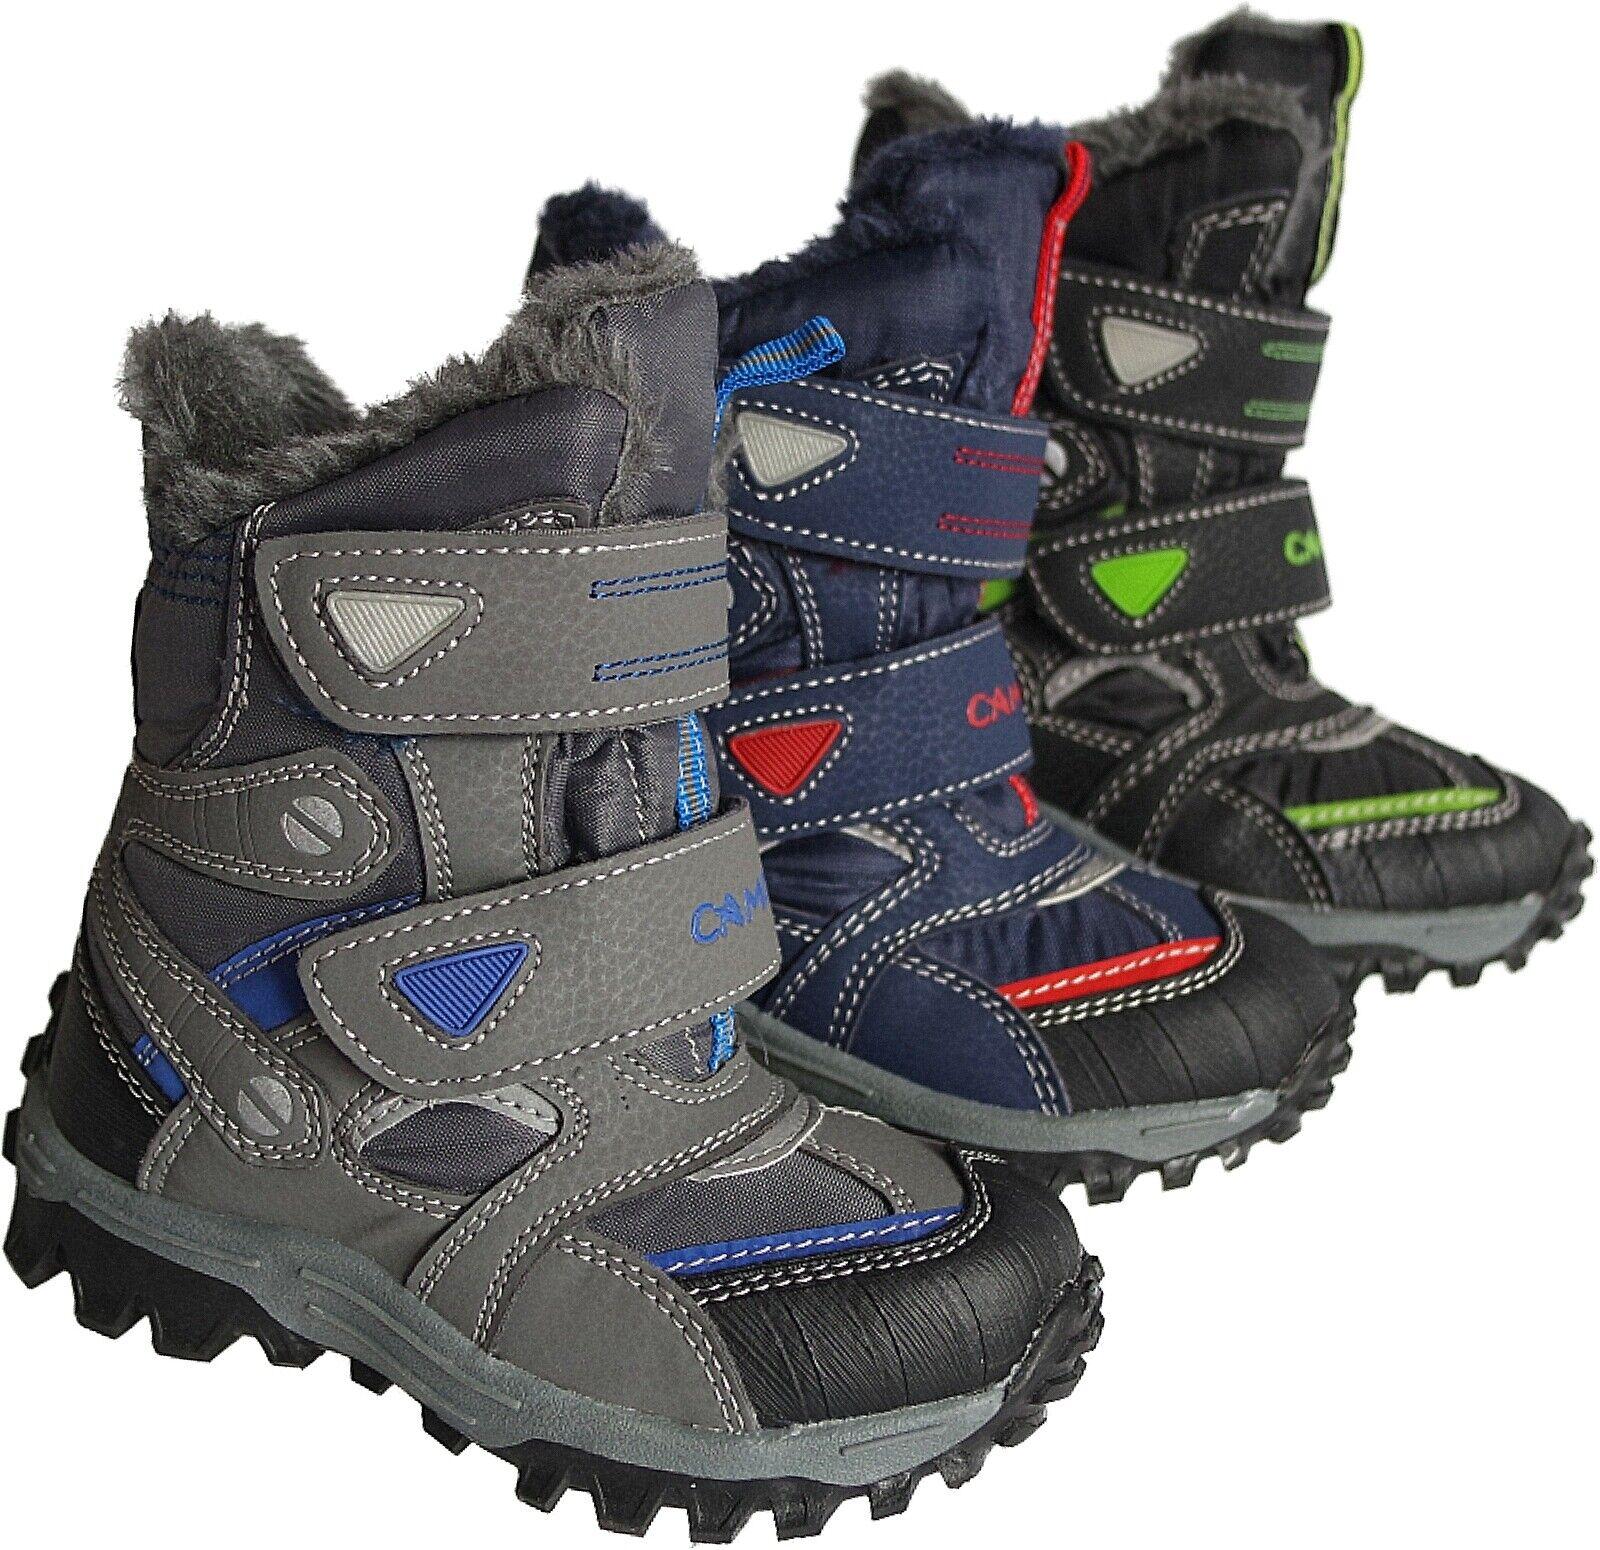 Jungen Kinder Winter Schuhe Stiefel Boots warm gefüttert Gr.25 - 36  Nr.5013/14